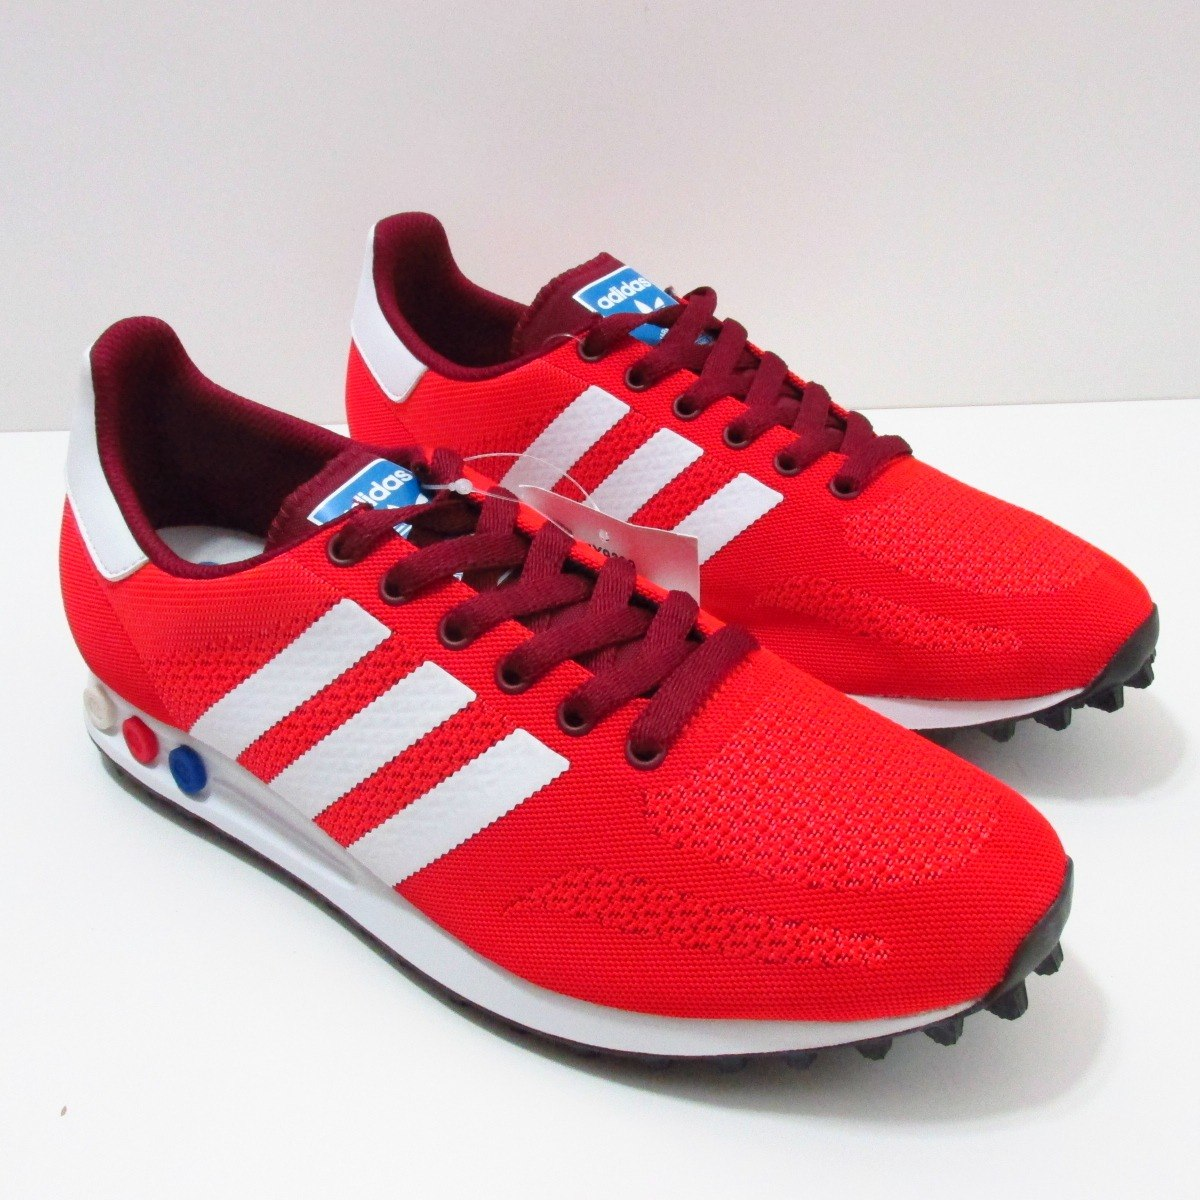 Carregando zoom... masculino adidas tênis. Carregando zoom... tênis  masculino adidas originals la trainer produto europeu 1a591edfdb7b0